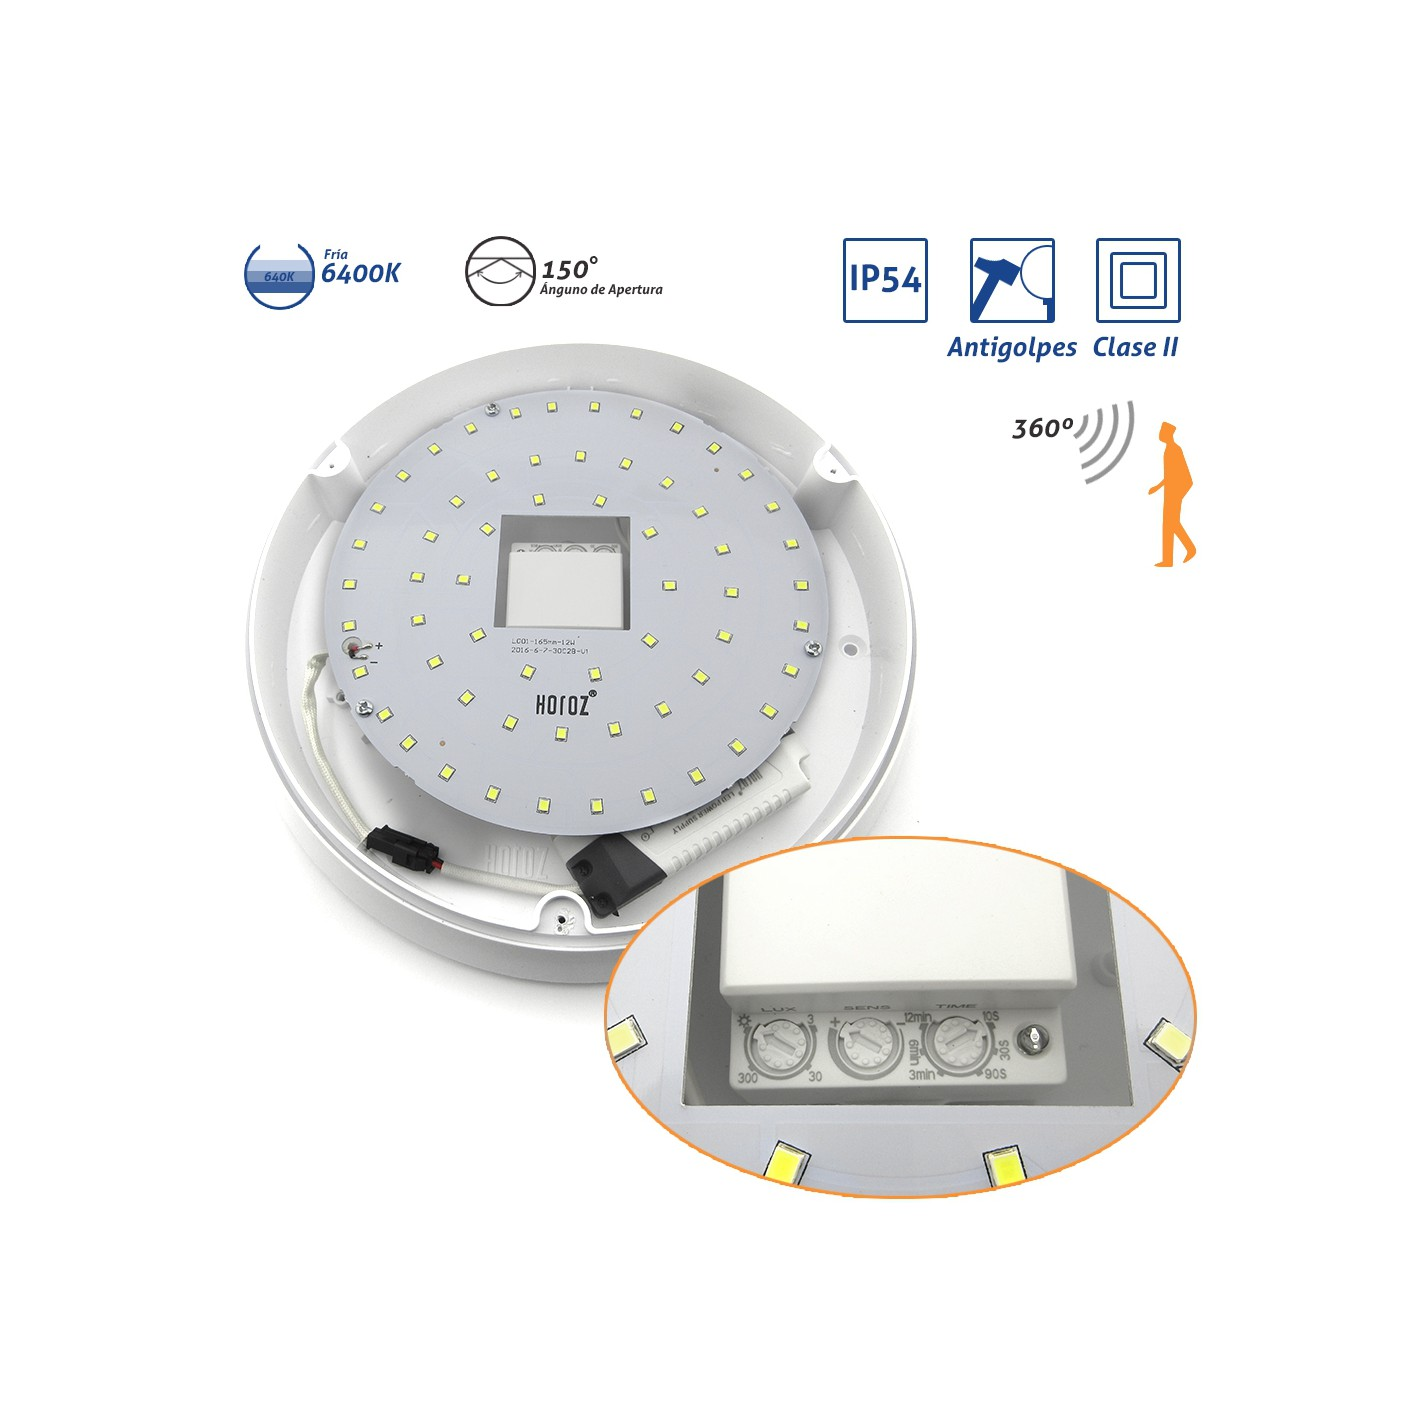 Plaf n exterior ip54 clase ii antivand lico blanco led for Plafon pared led con sensor pir